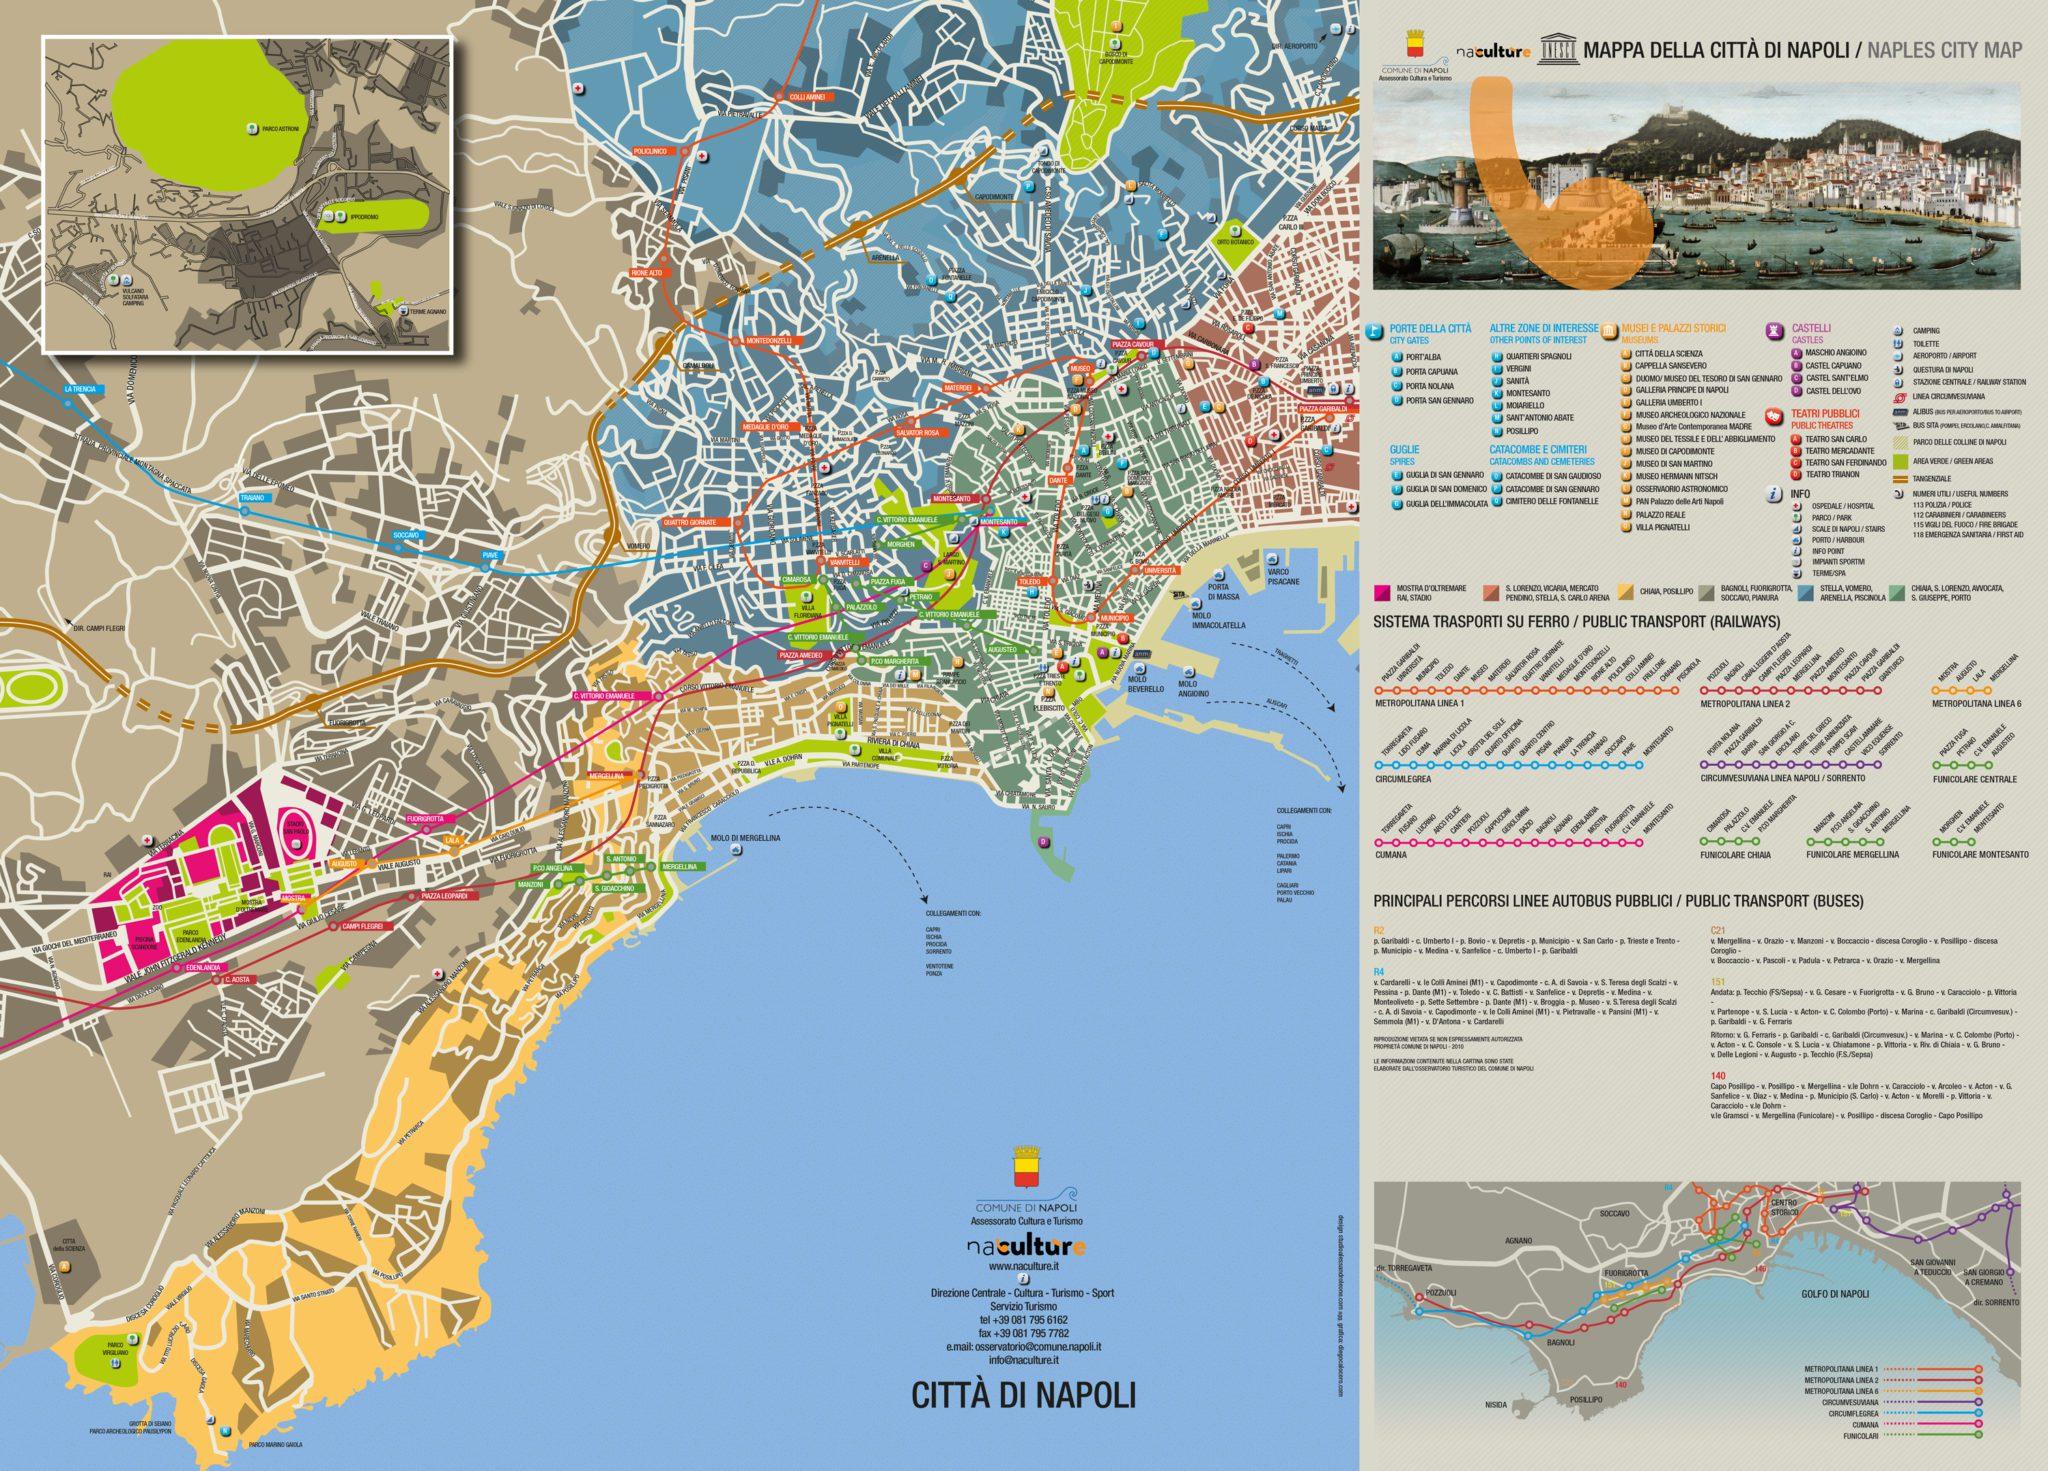 Napoli city map